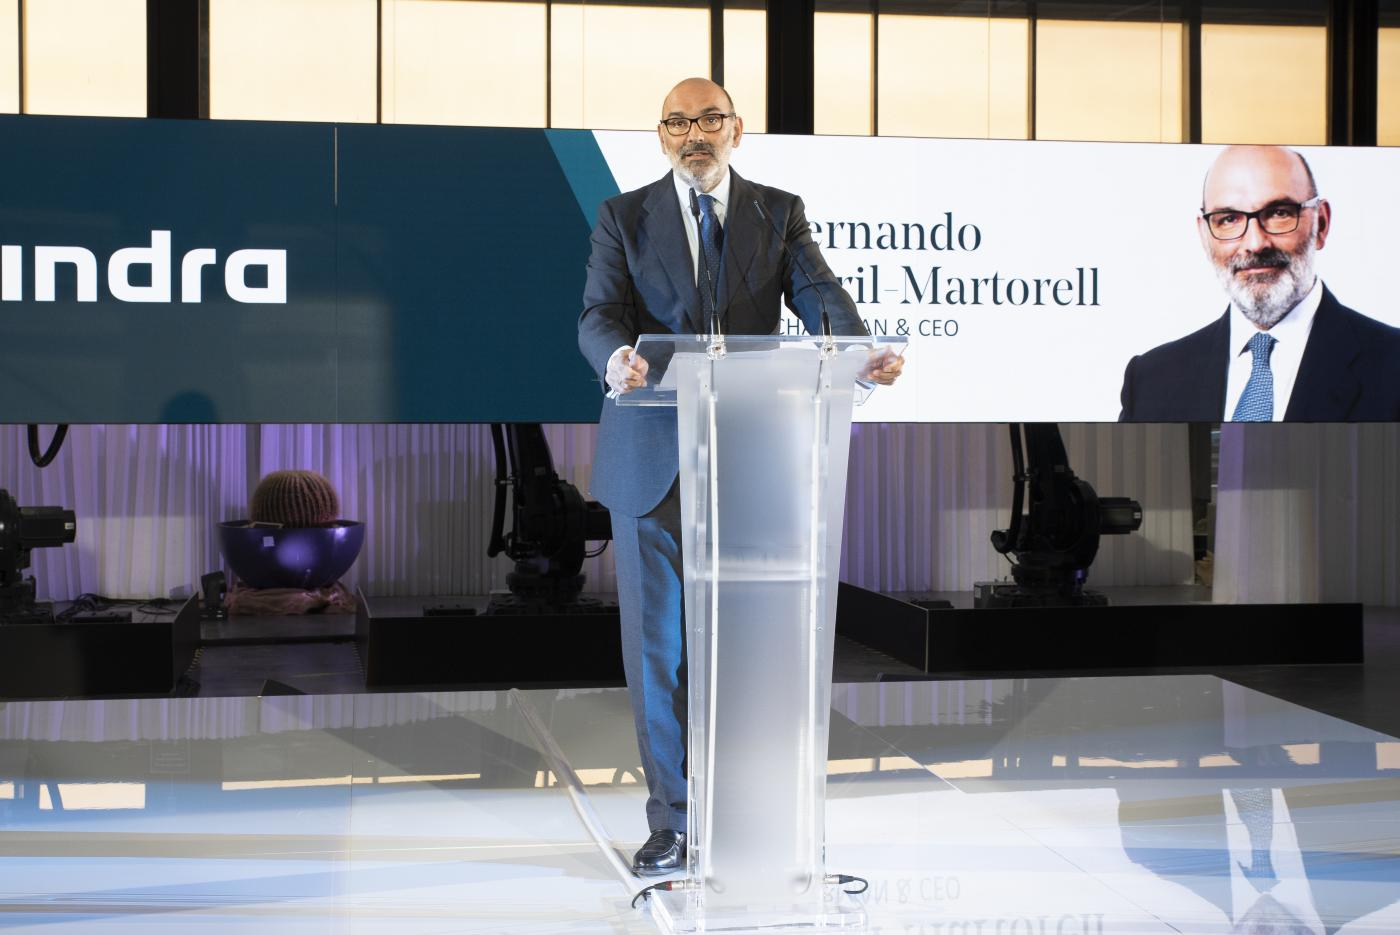 Estrategia de Fernando Abril-Martorell al frente de Indra: comprar, que no rentabilizar